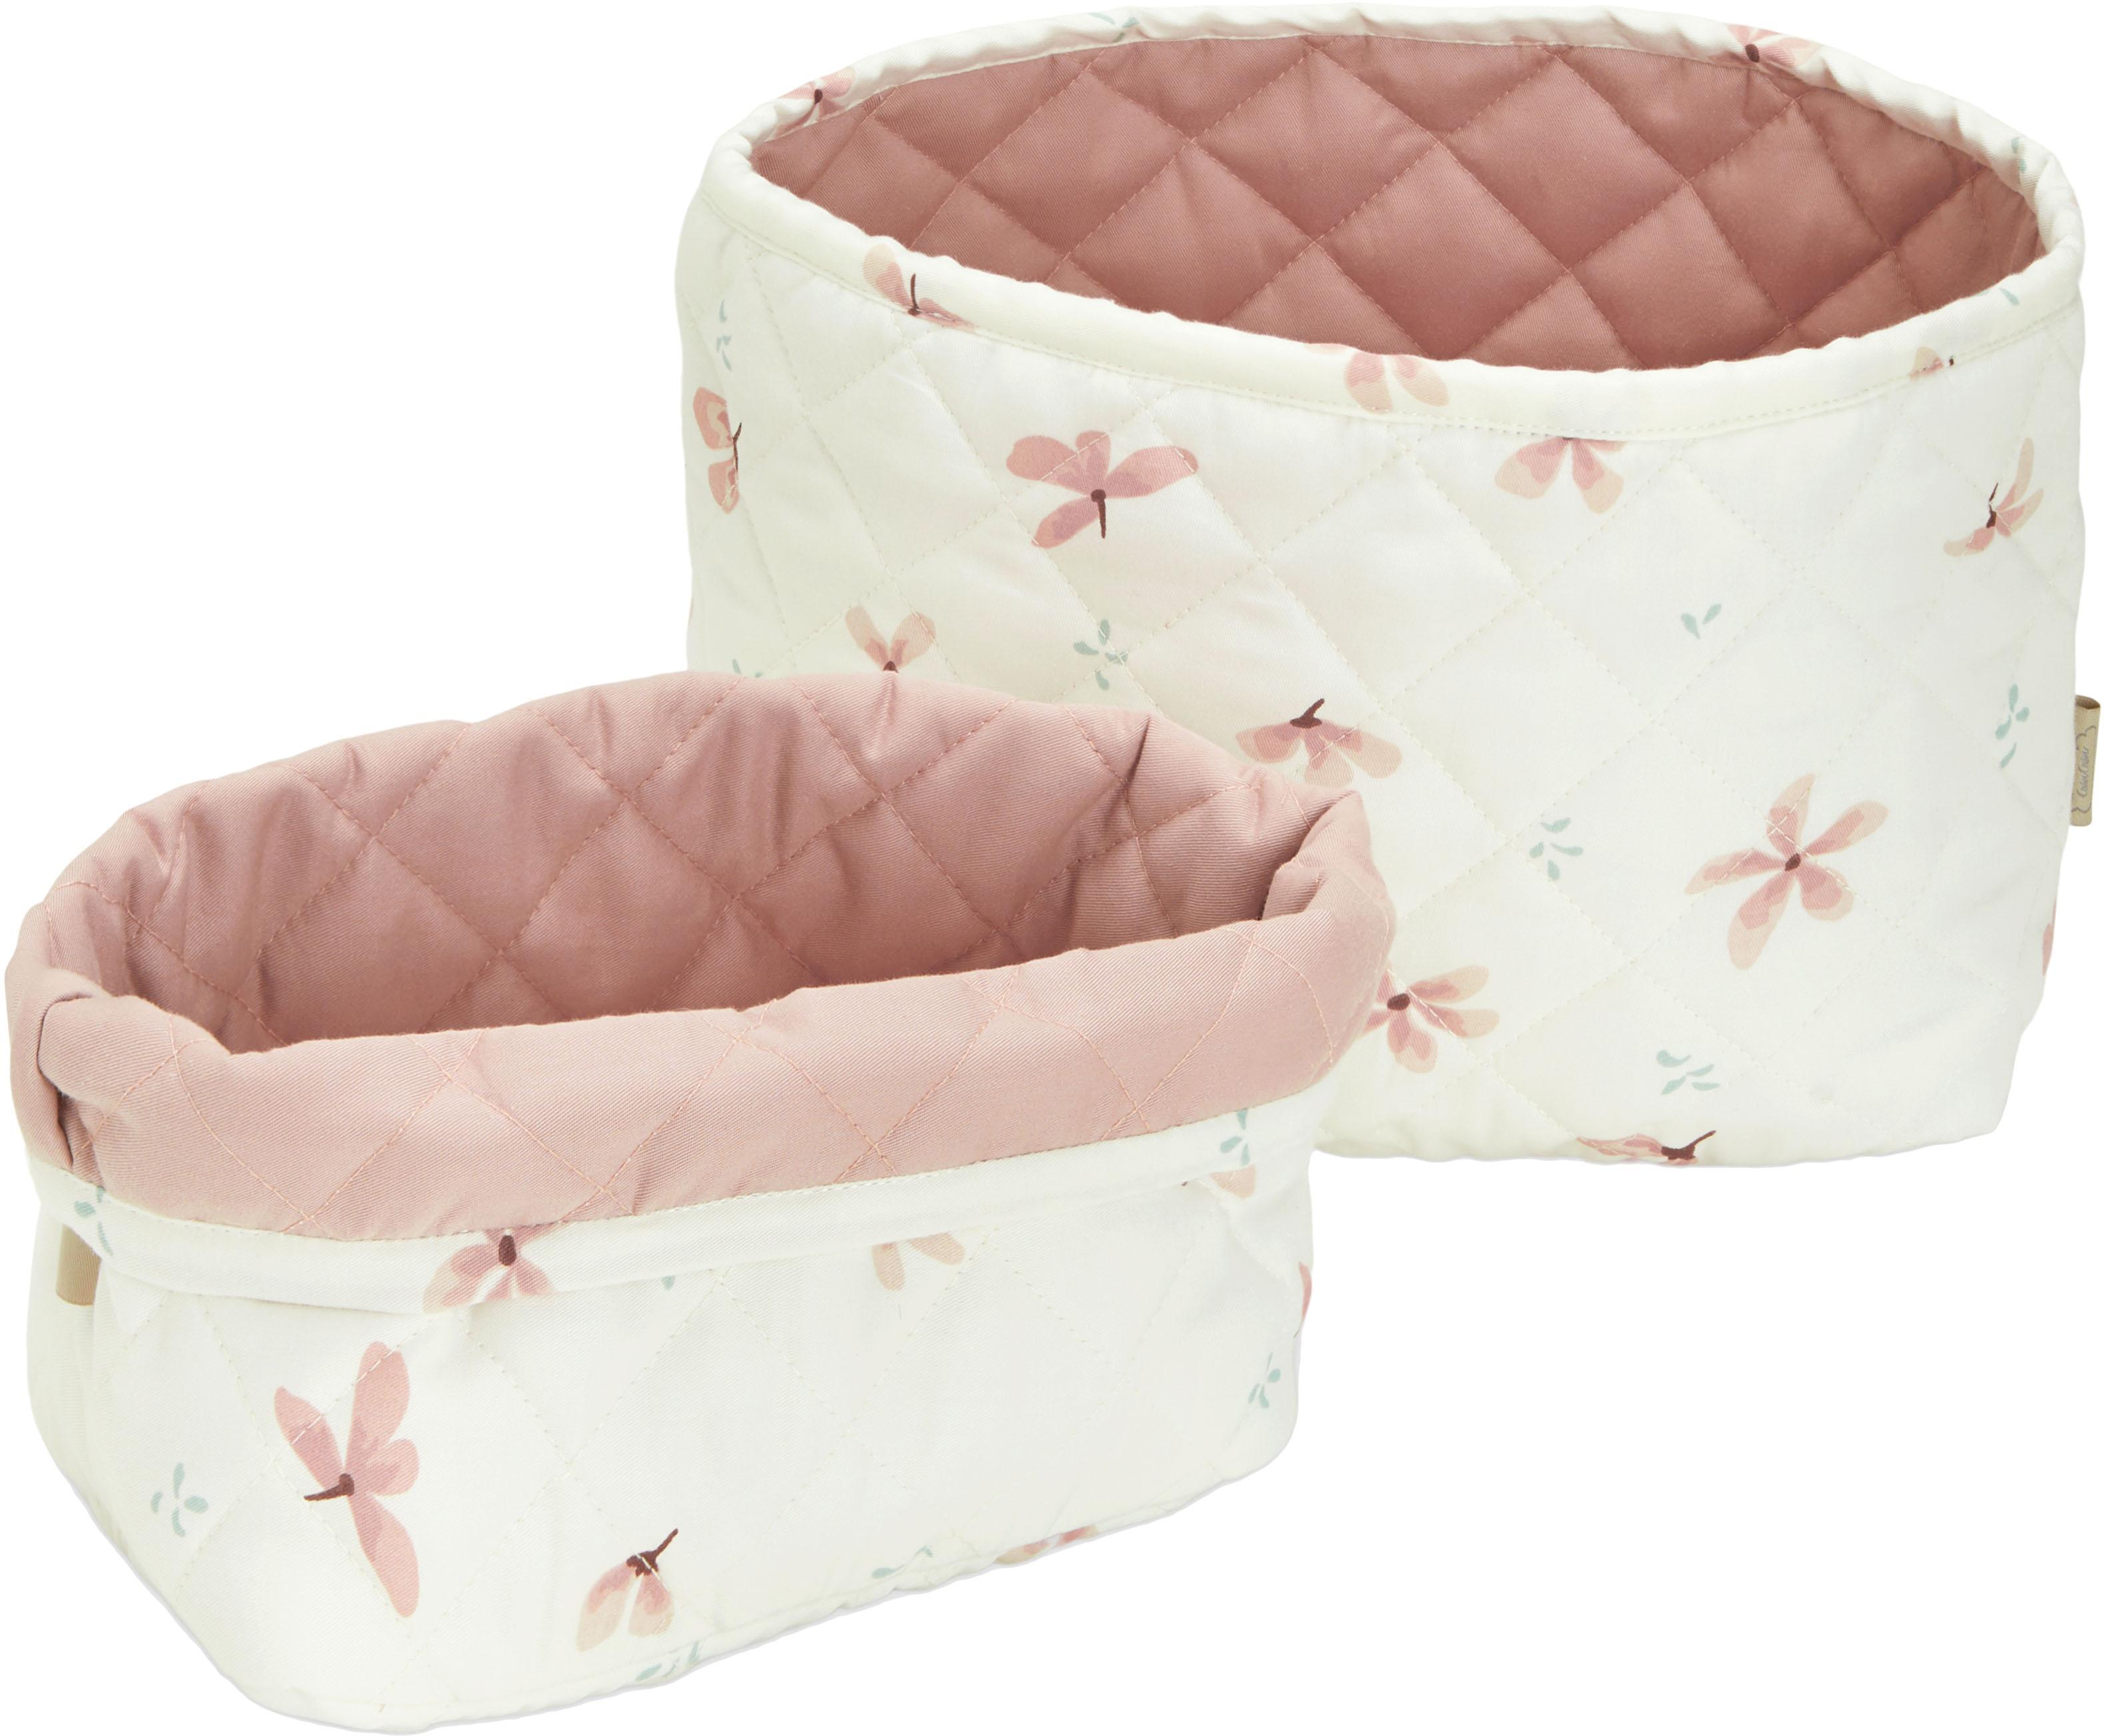 Set de cestas de algodón ecológico Wildflower, 2pzas., Funda: 100%algodón ecológico, c, Crema, rosa, Set de diferentes tamaños